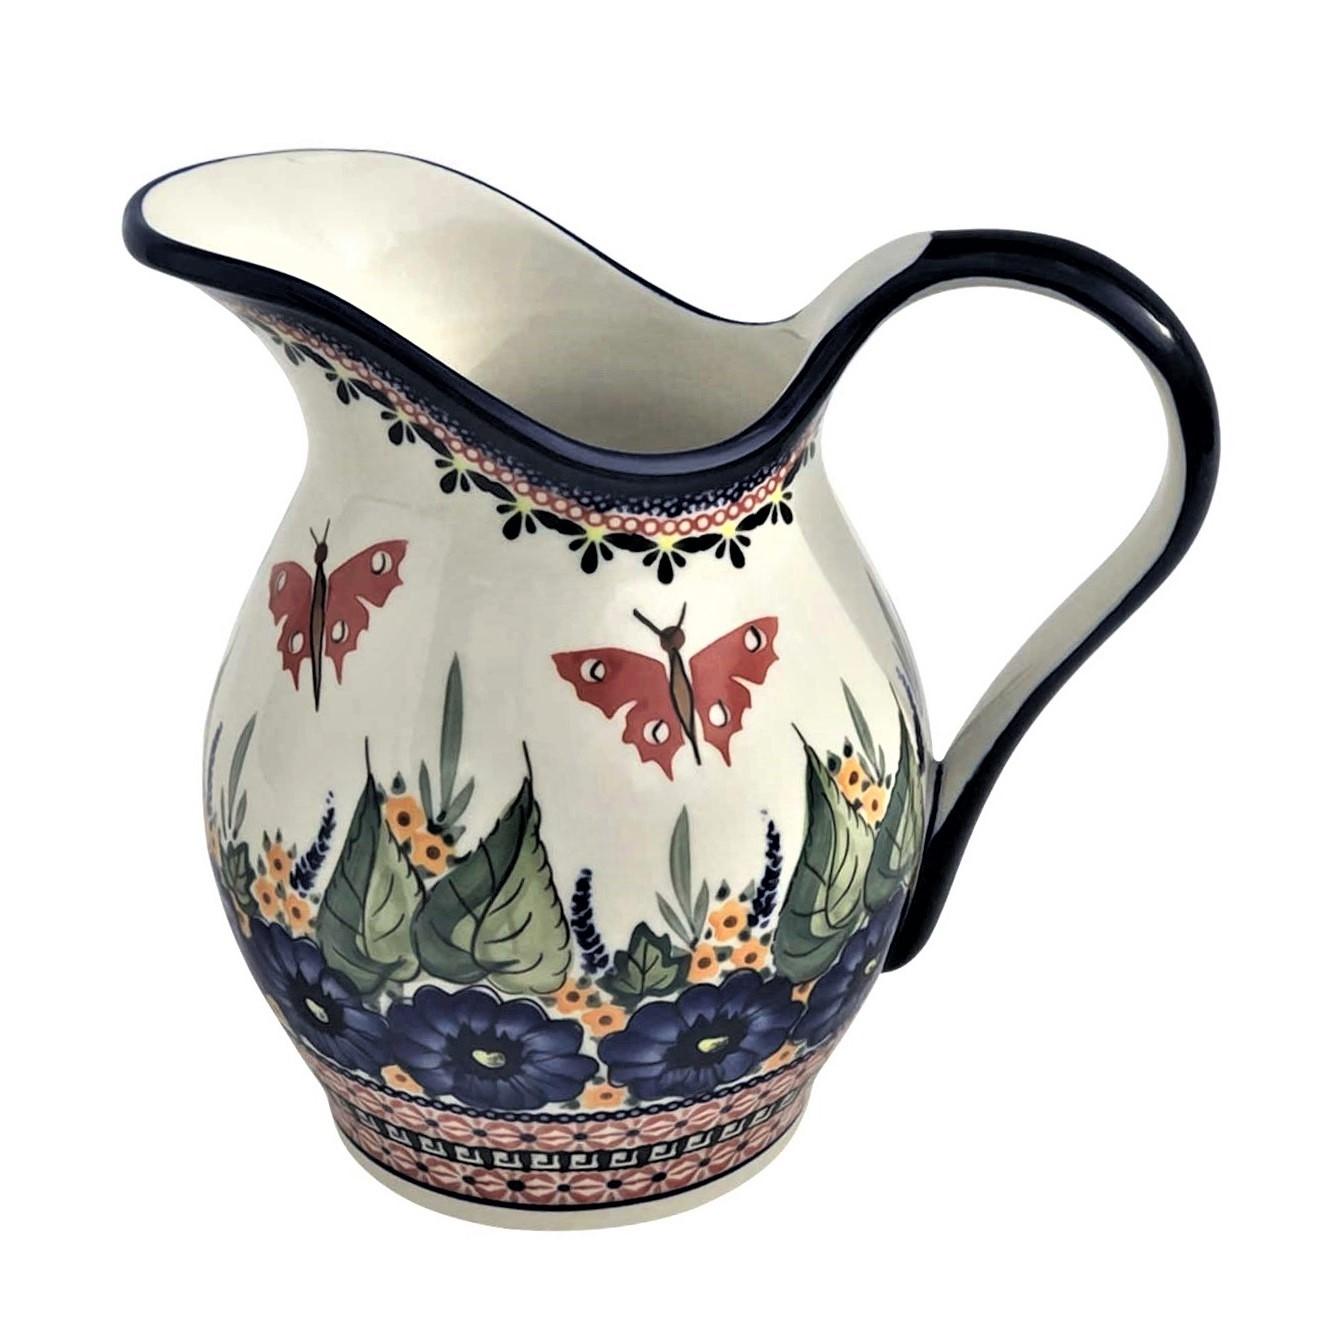 Pottery Avenue 2-quart Stoneware Pitcher - 1160-208AR Strawberry Butterfly